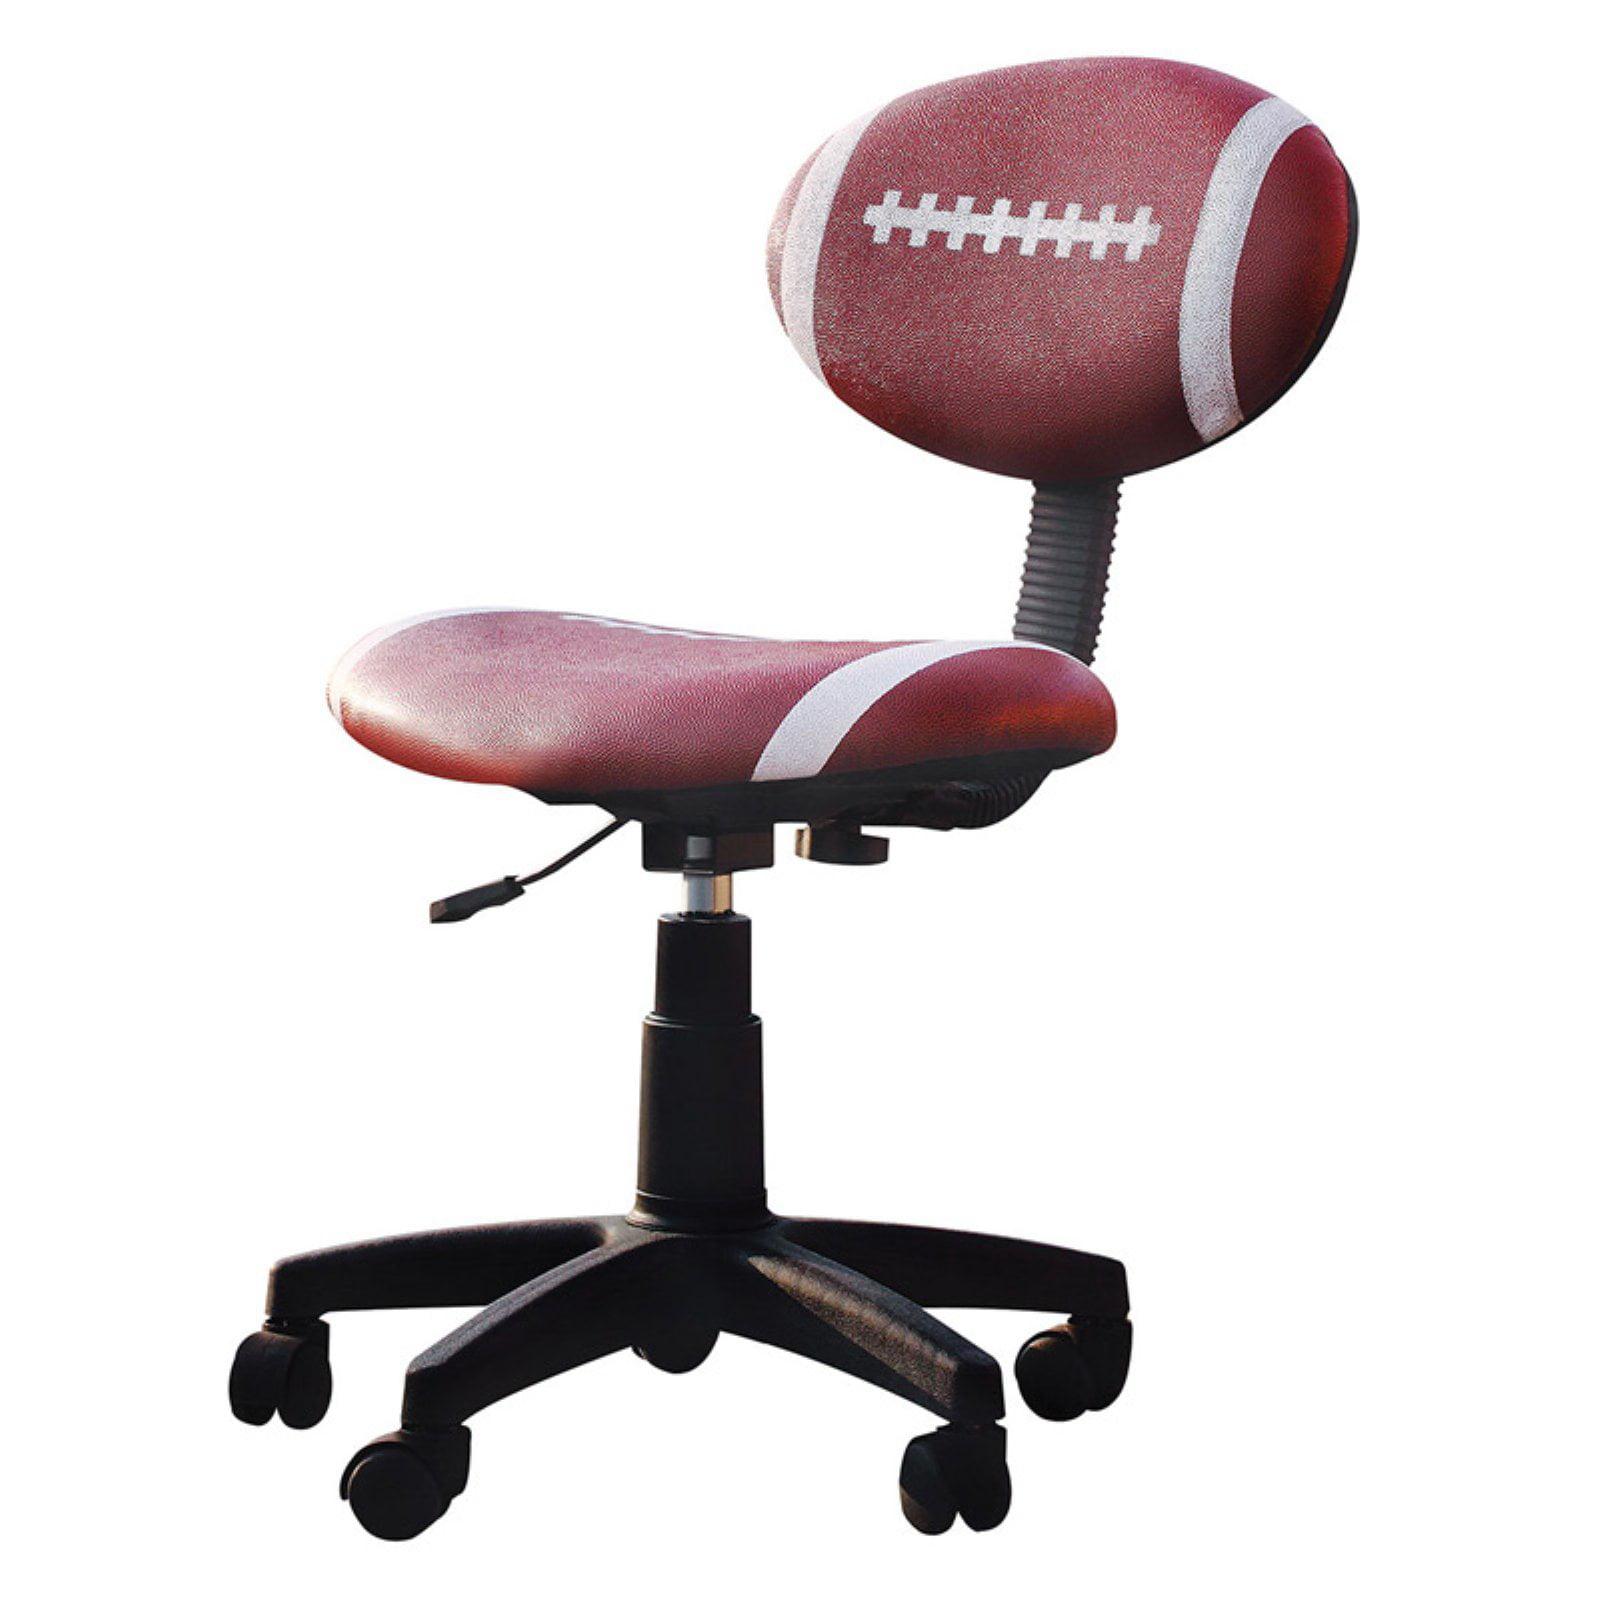 ACME Furniture Maya Football Office Task Chair